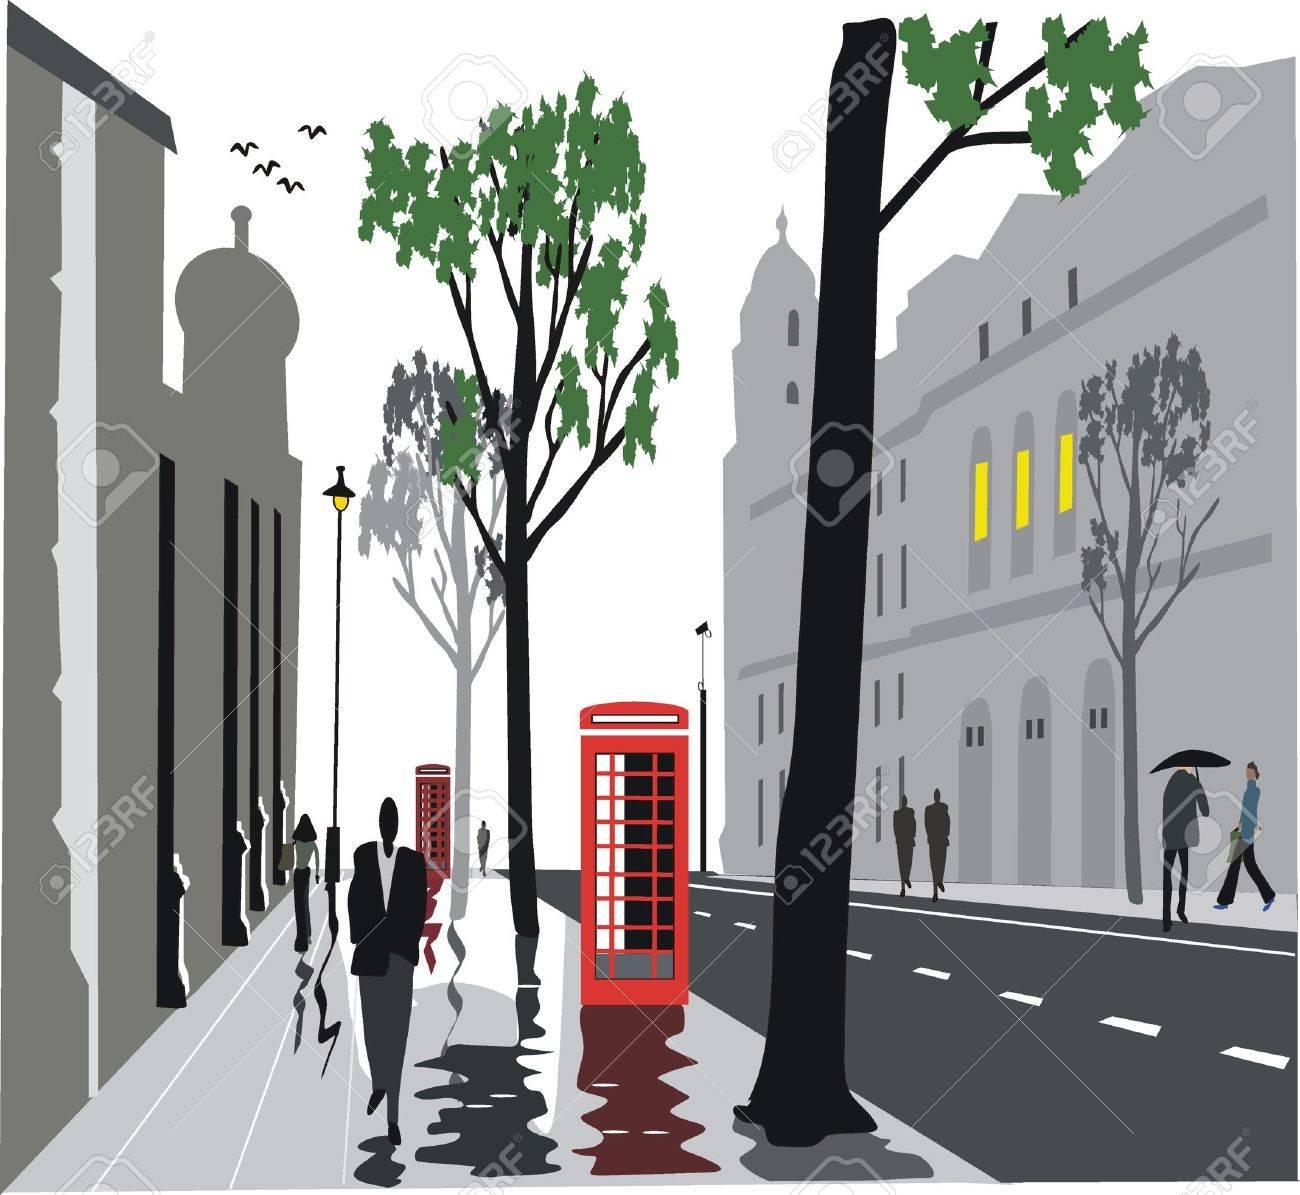 London city street illustration Stock Vector - 8772496